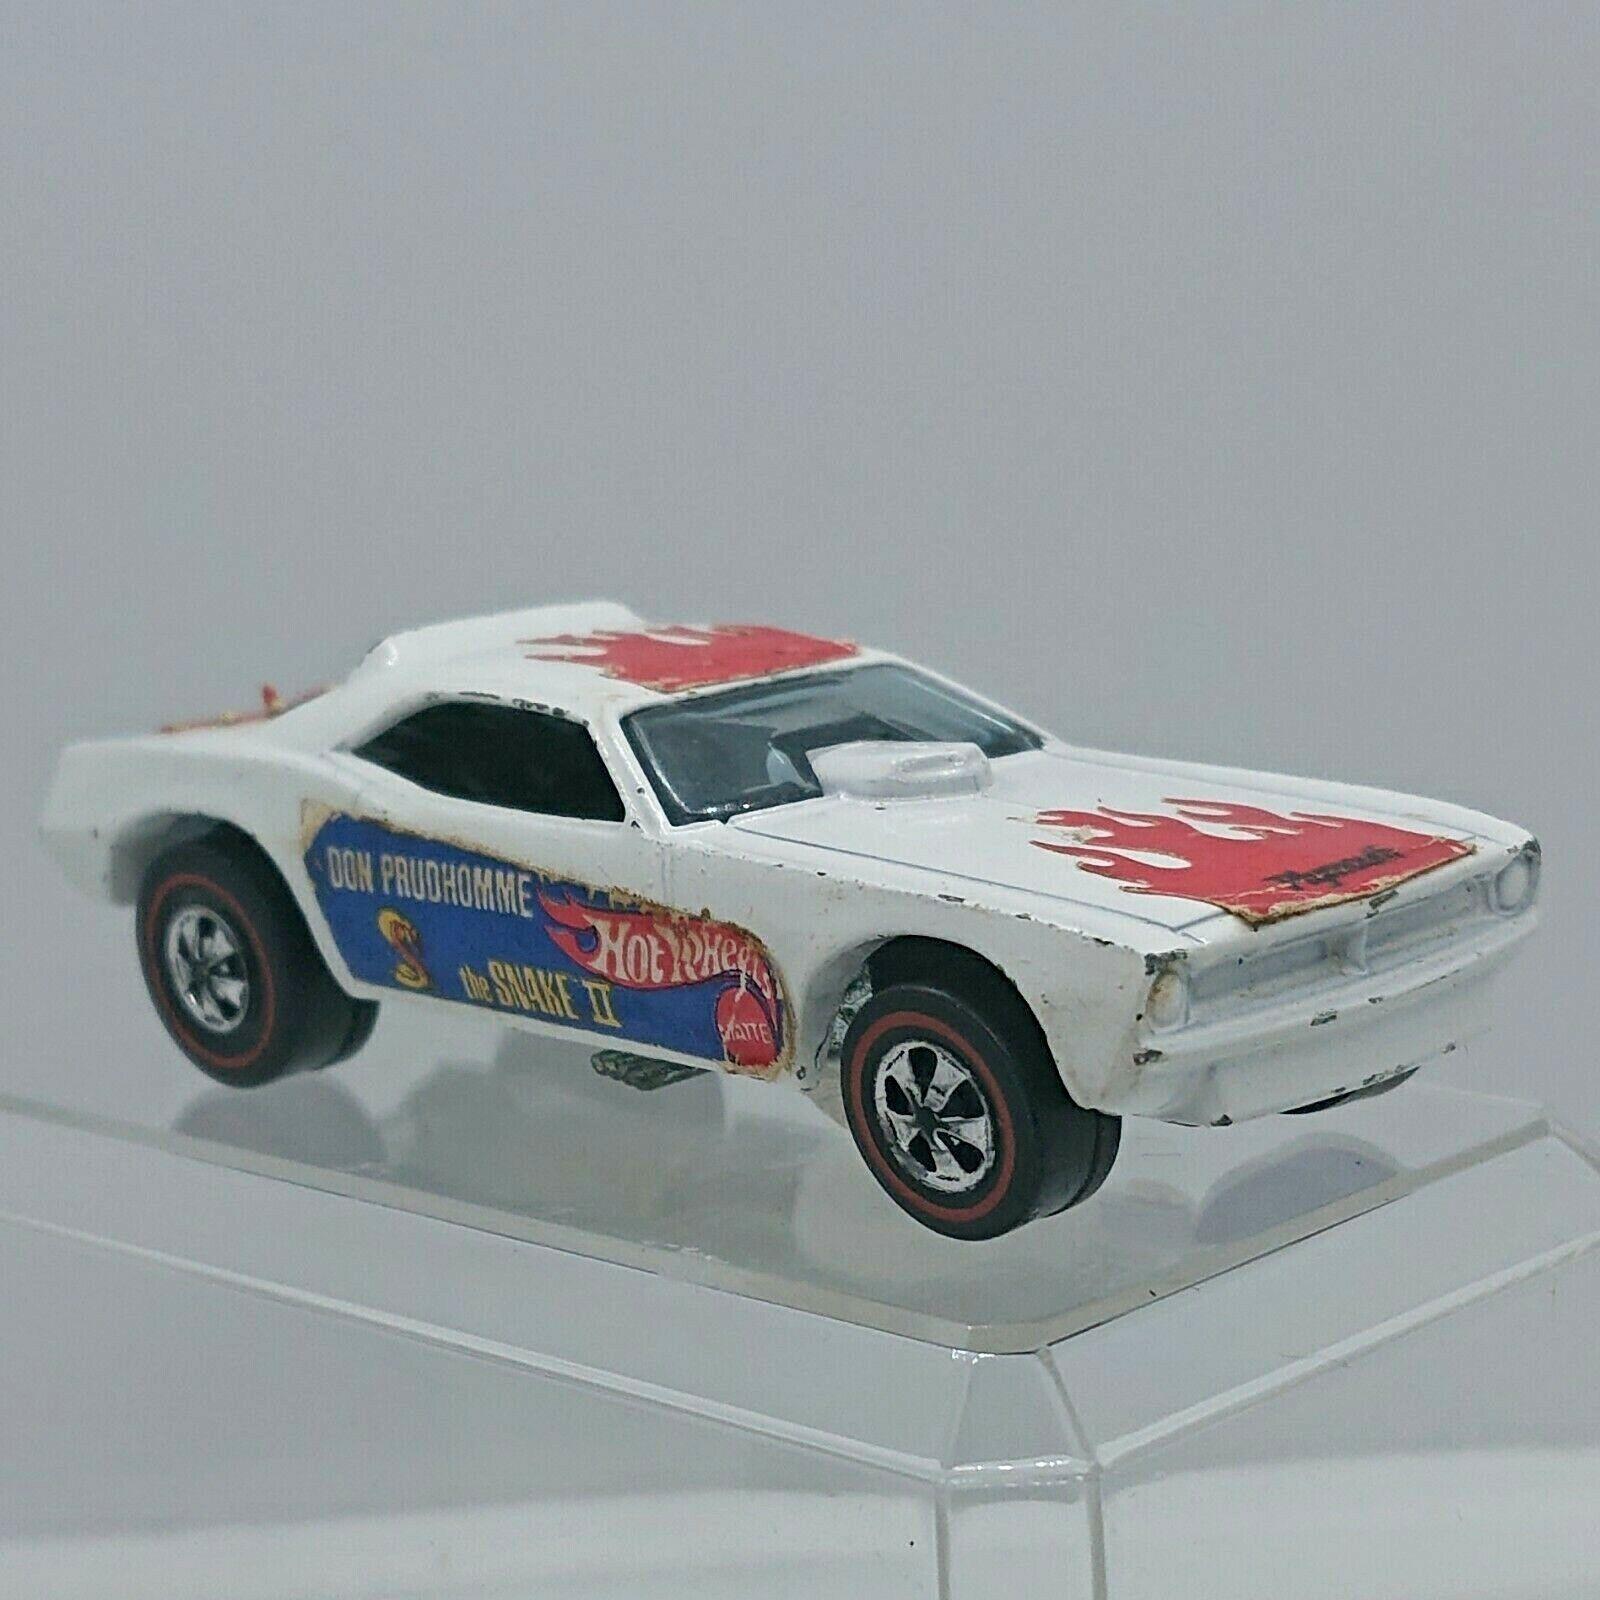 1971 Hot Wheels Serpiente II bianca rossoline USA hw1174